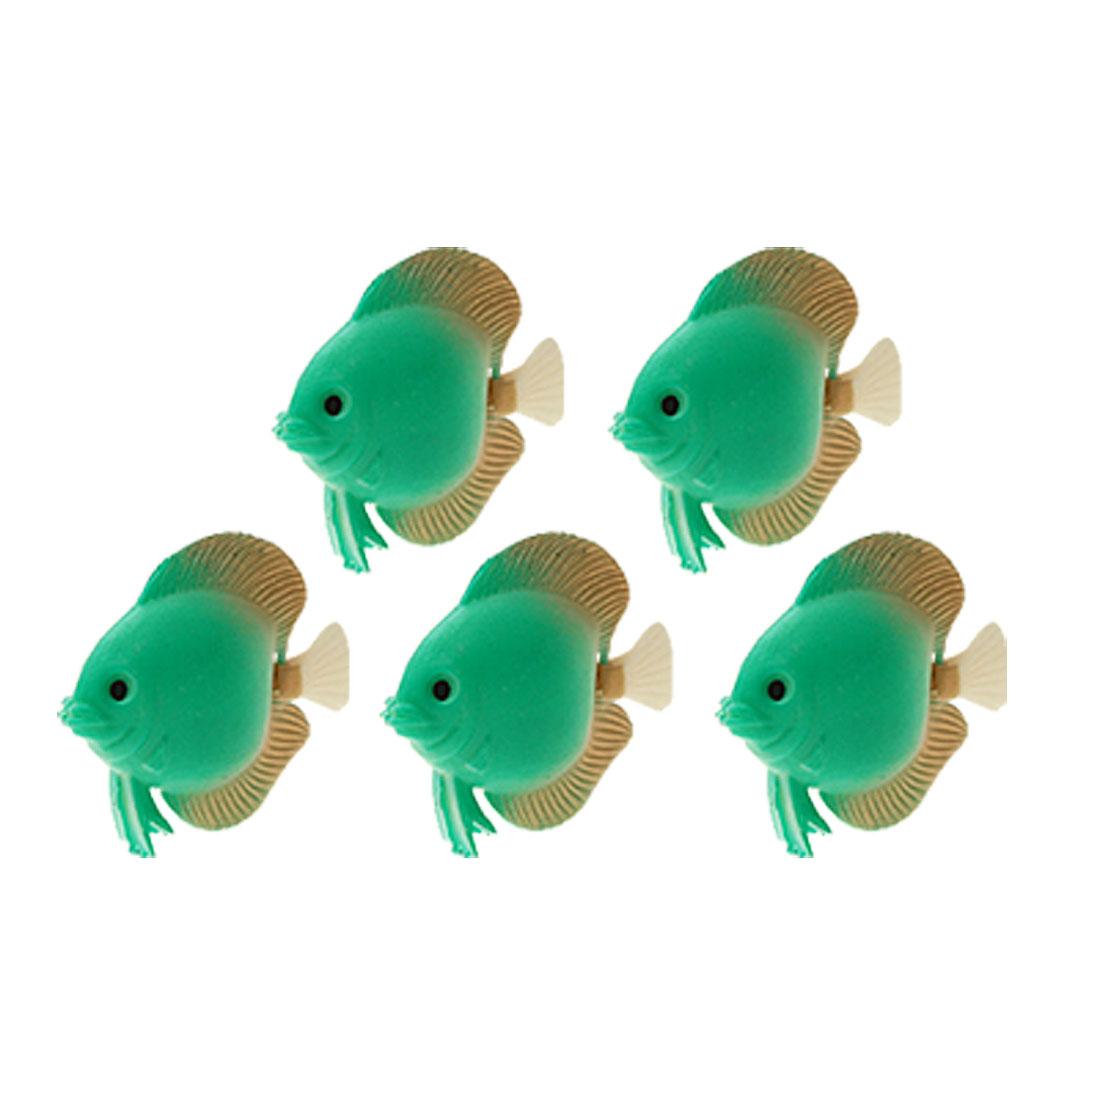 5 Pieces Plastic Green Fish for Aquarium Water Tank